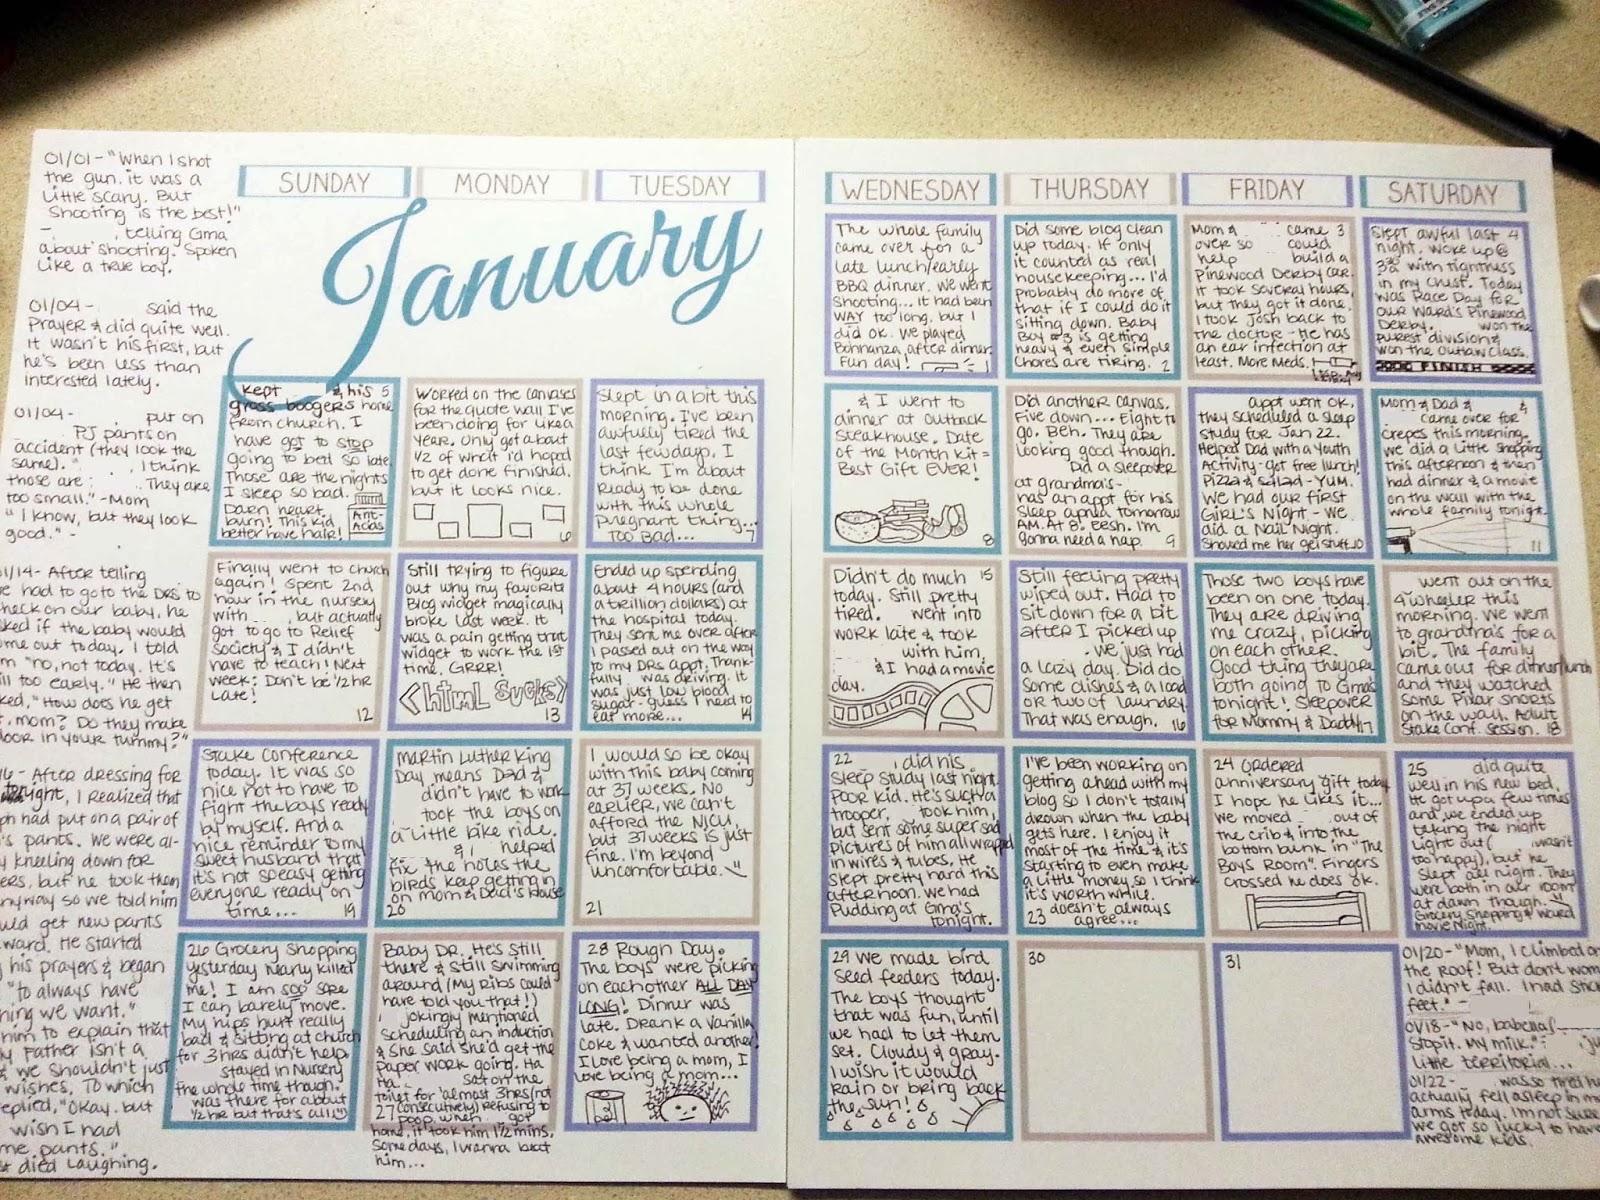 Printable 8x10 2016 Calendars February   Calendar Template 2016